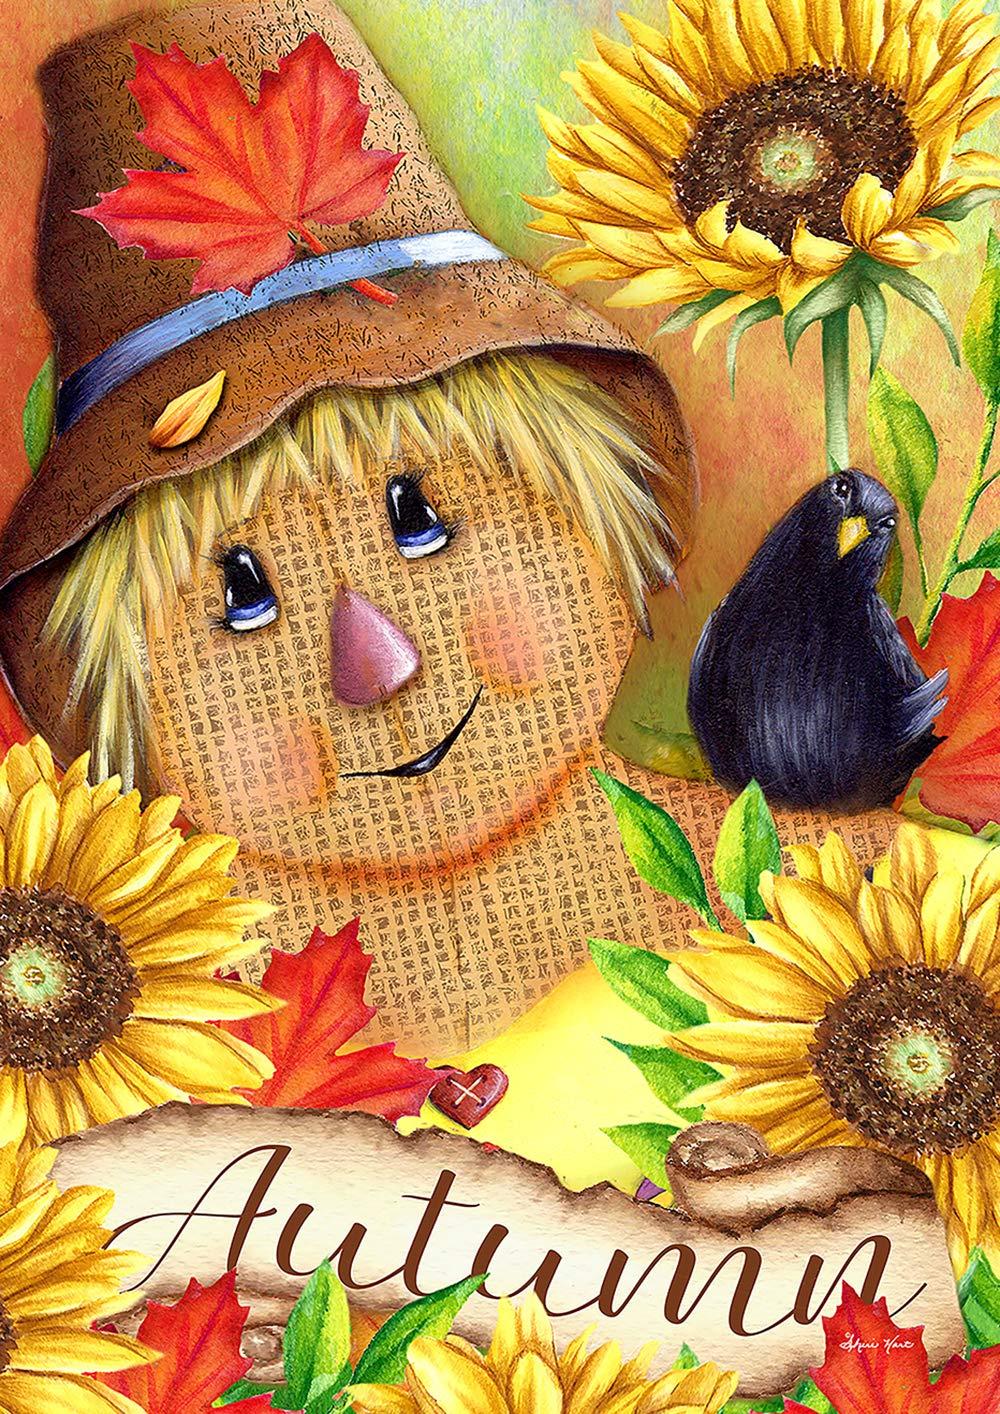 Toland Home Garden 1012215 Autumn Scarecrow 28 x 40 inch Decorative, Fall Harvest Happy Friends, House Flag